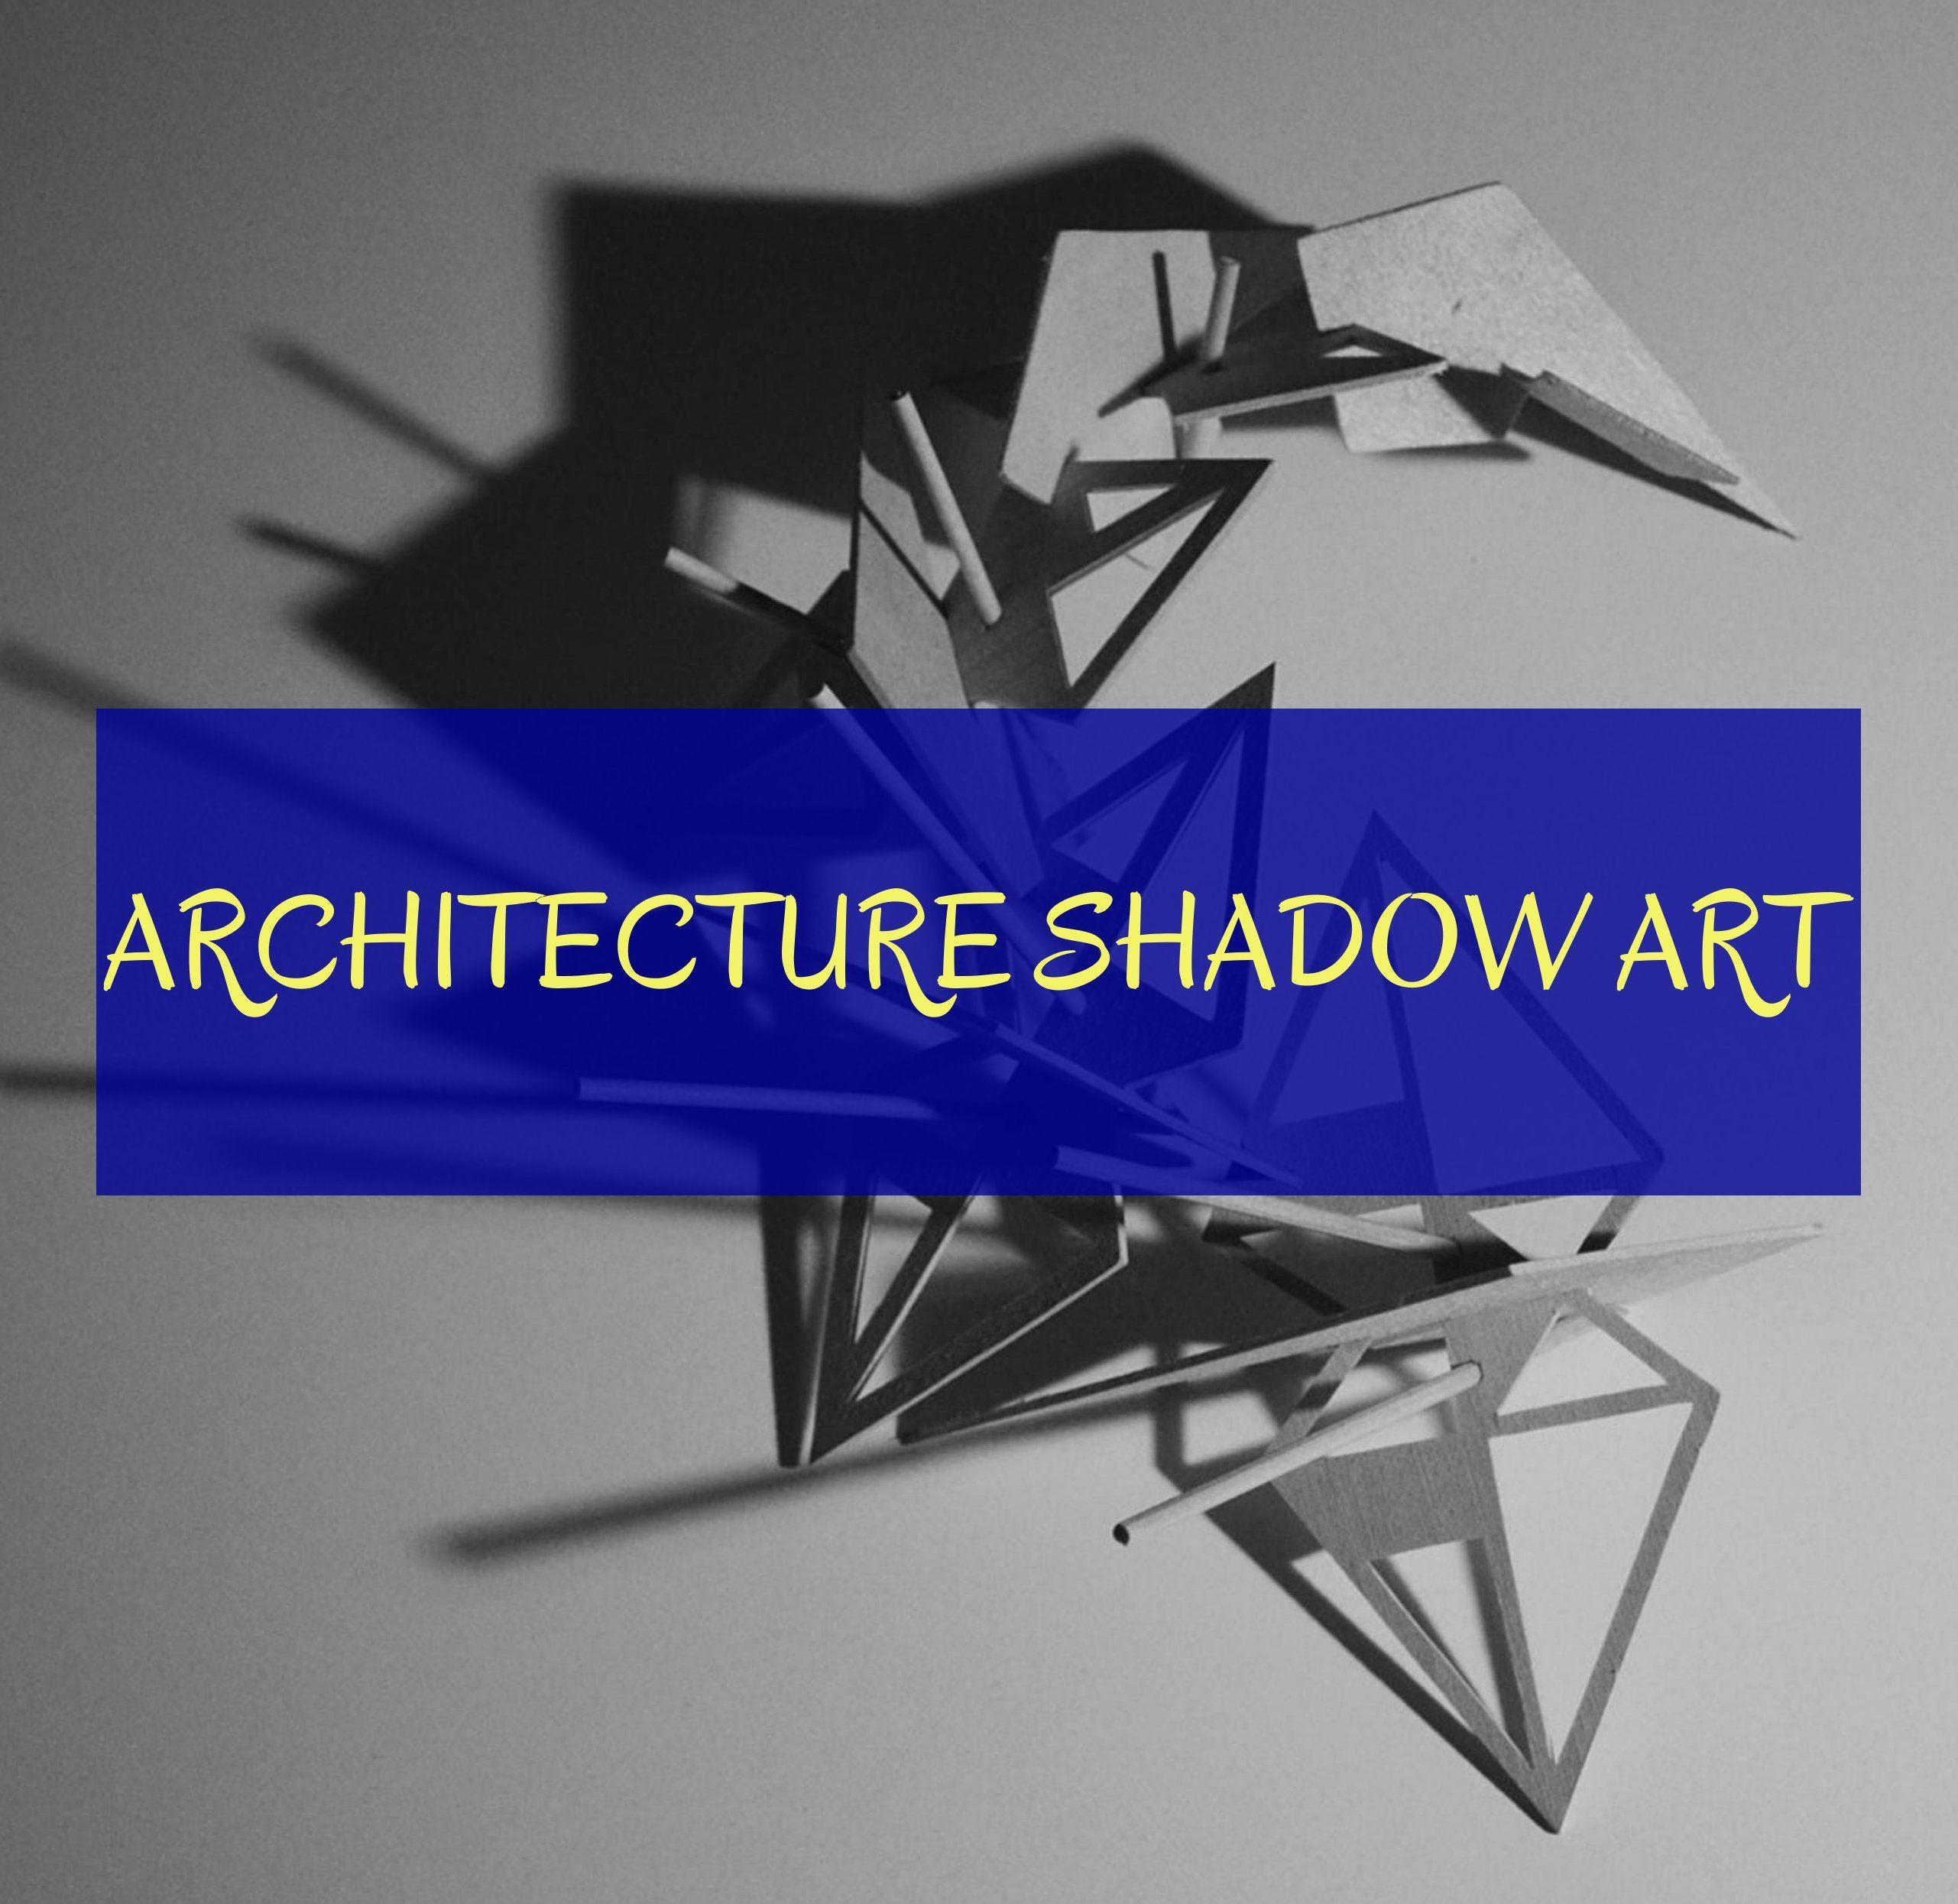 architecture shadow art